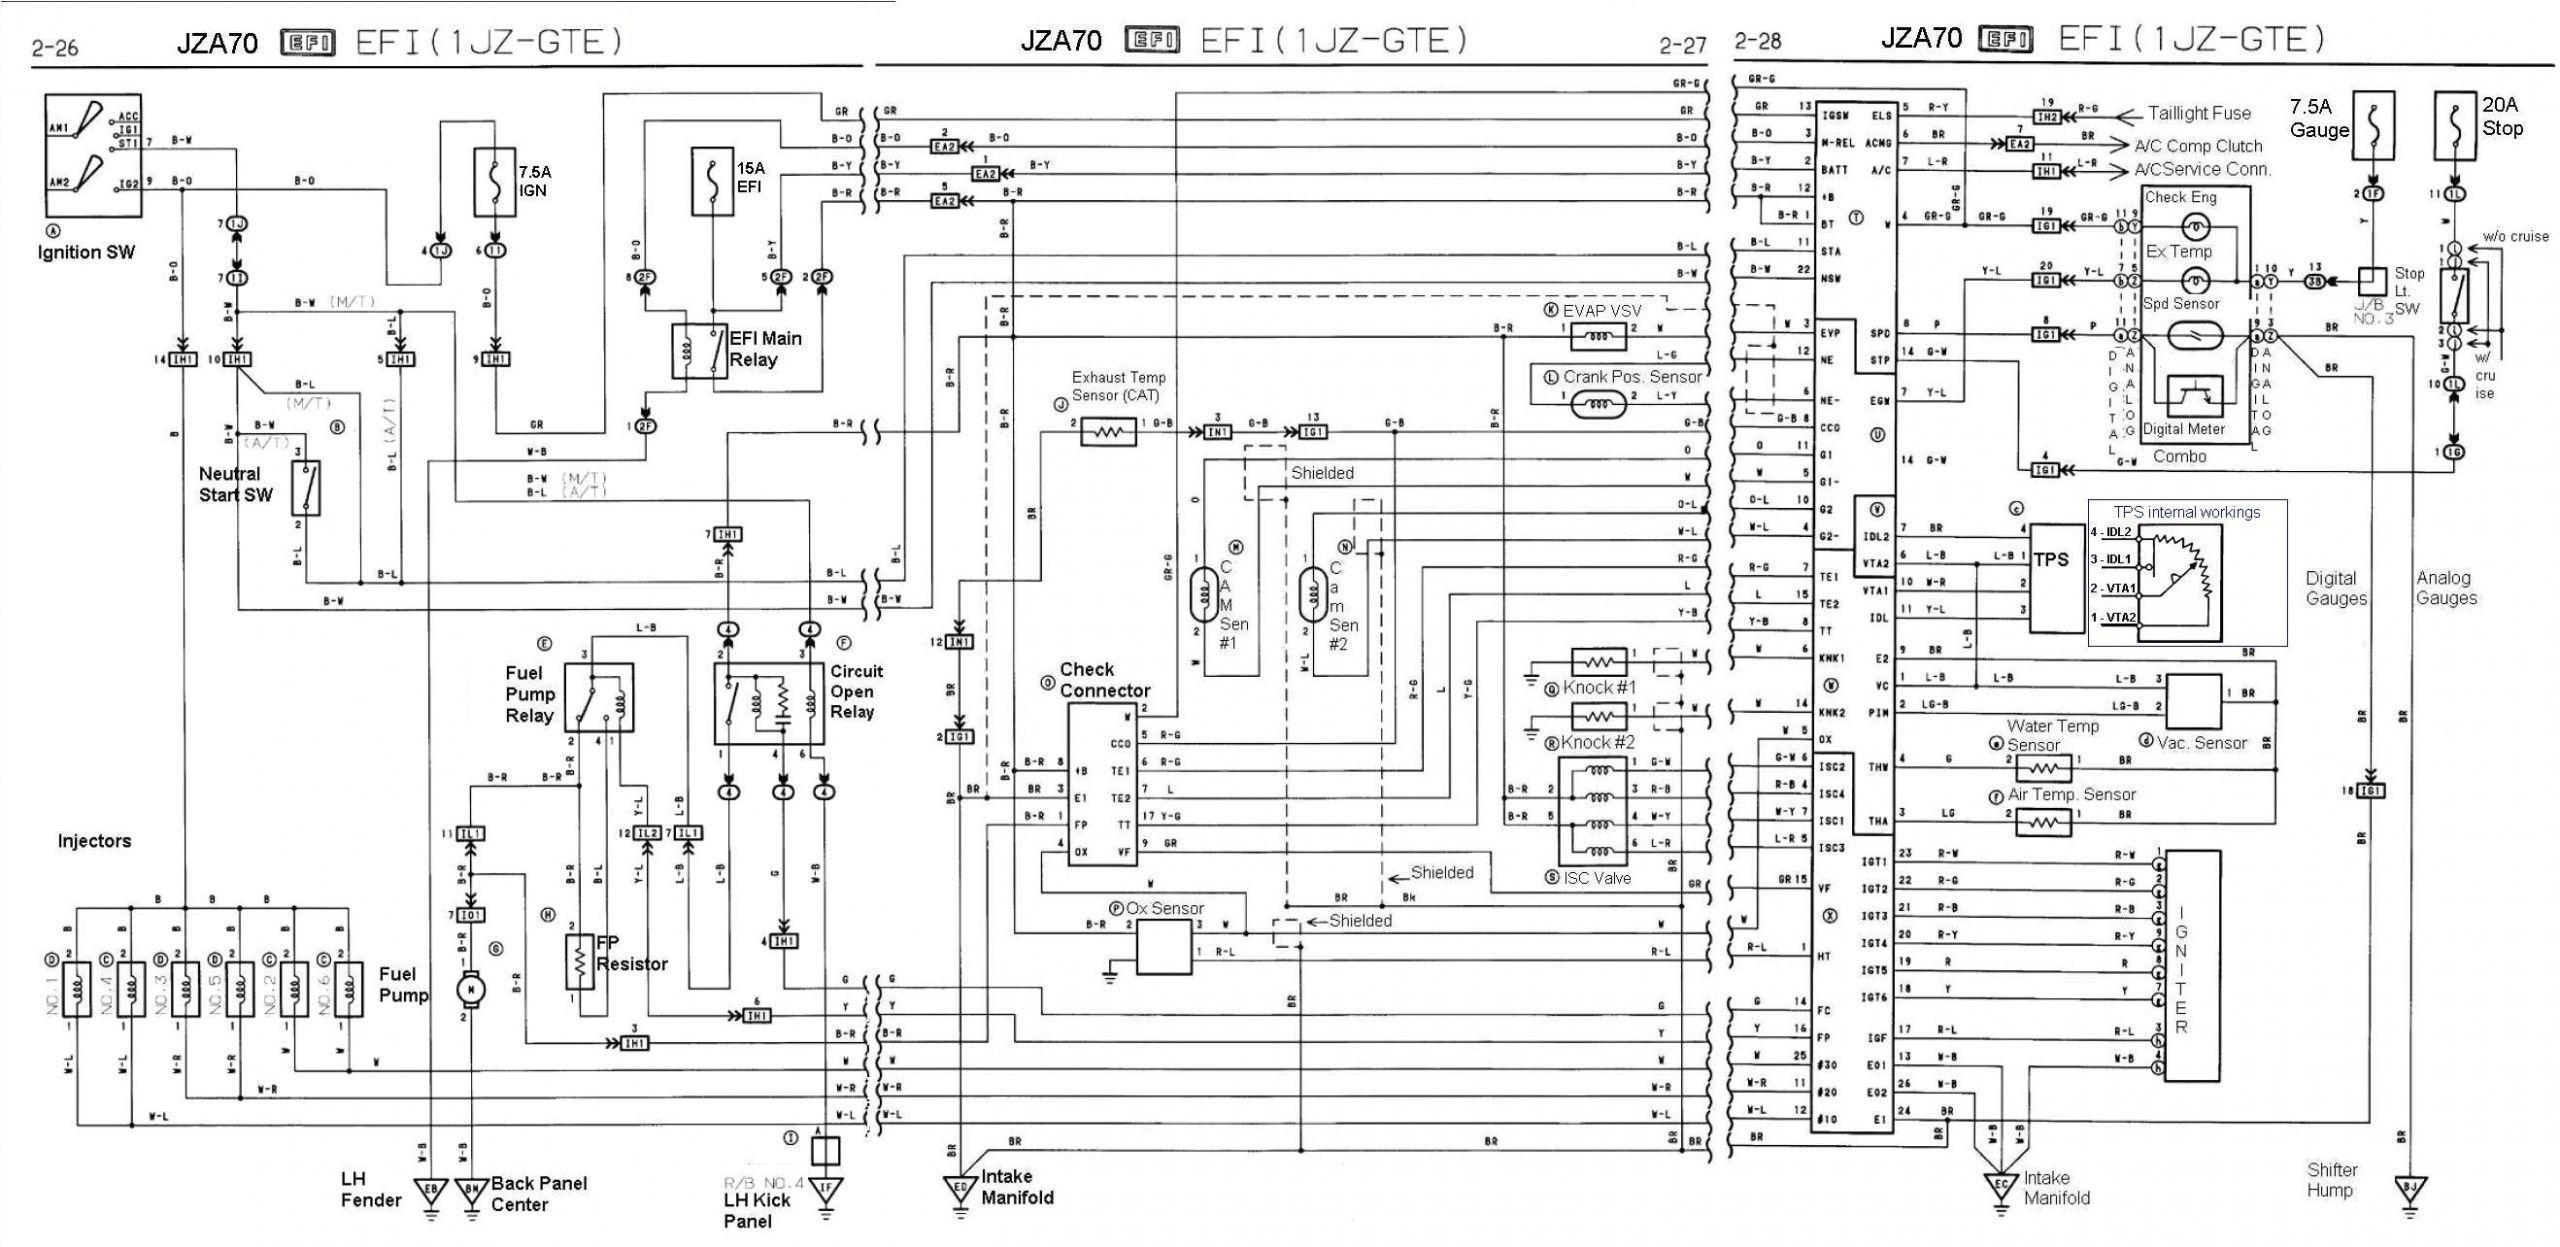 Bmw E46 Engine Wiring Harness Diagram E39 Wiring Diagrams Blog Wiring Diagram